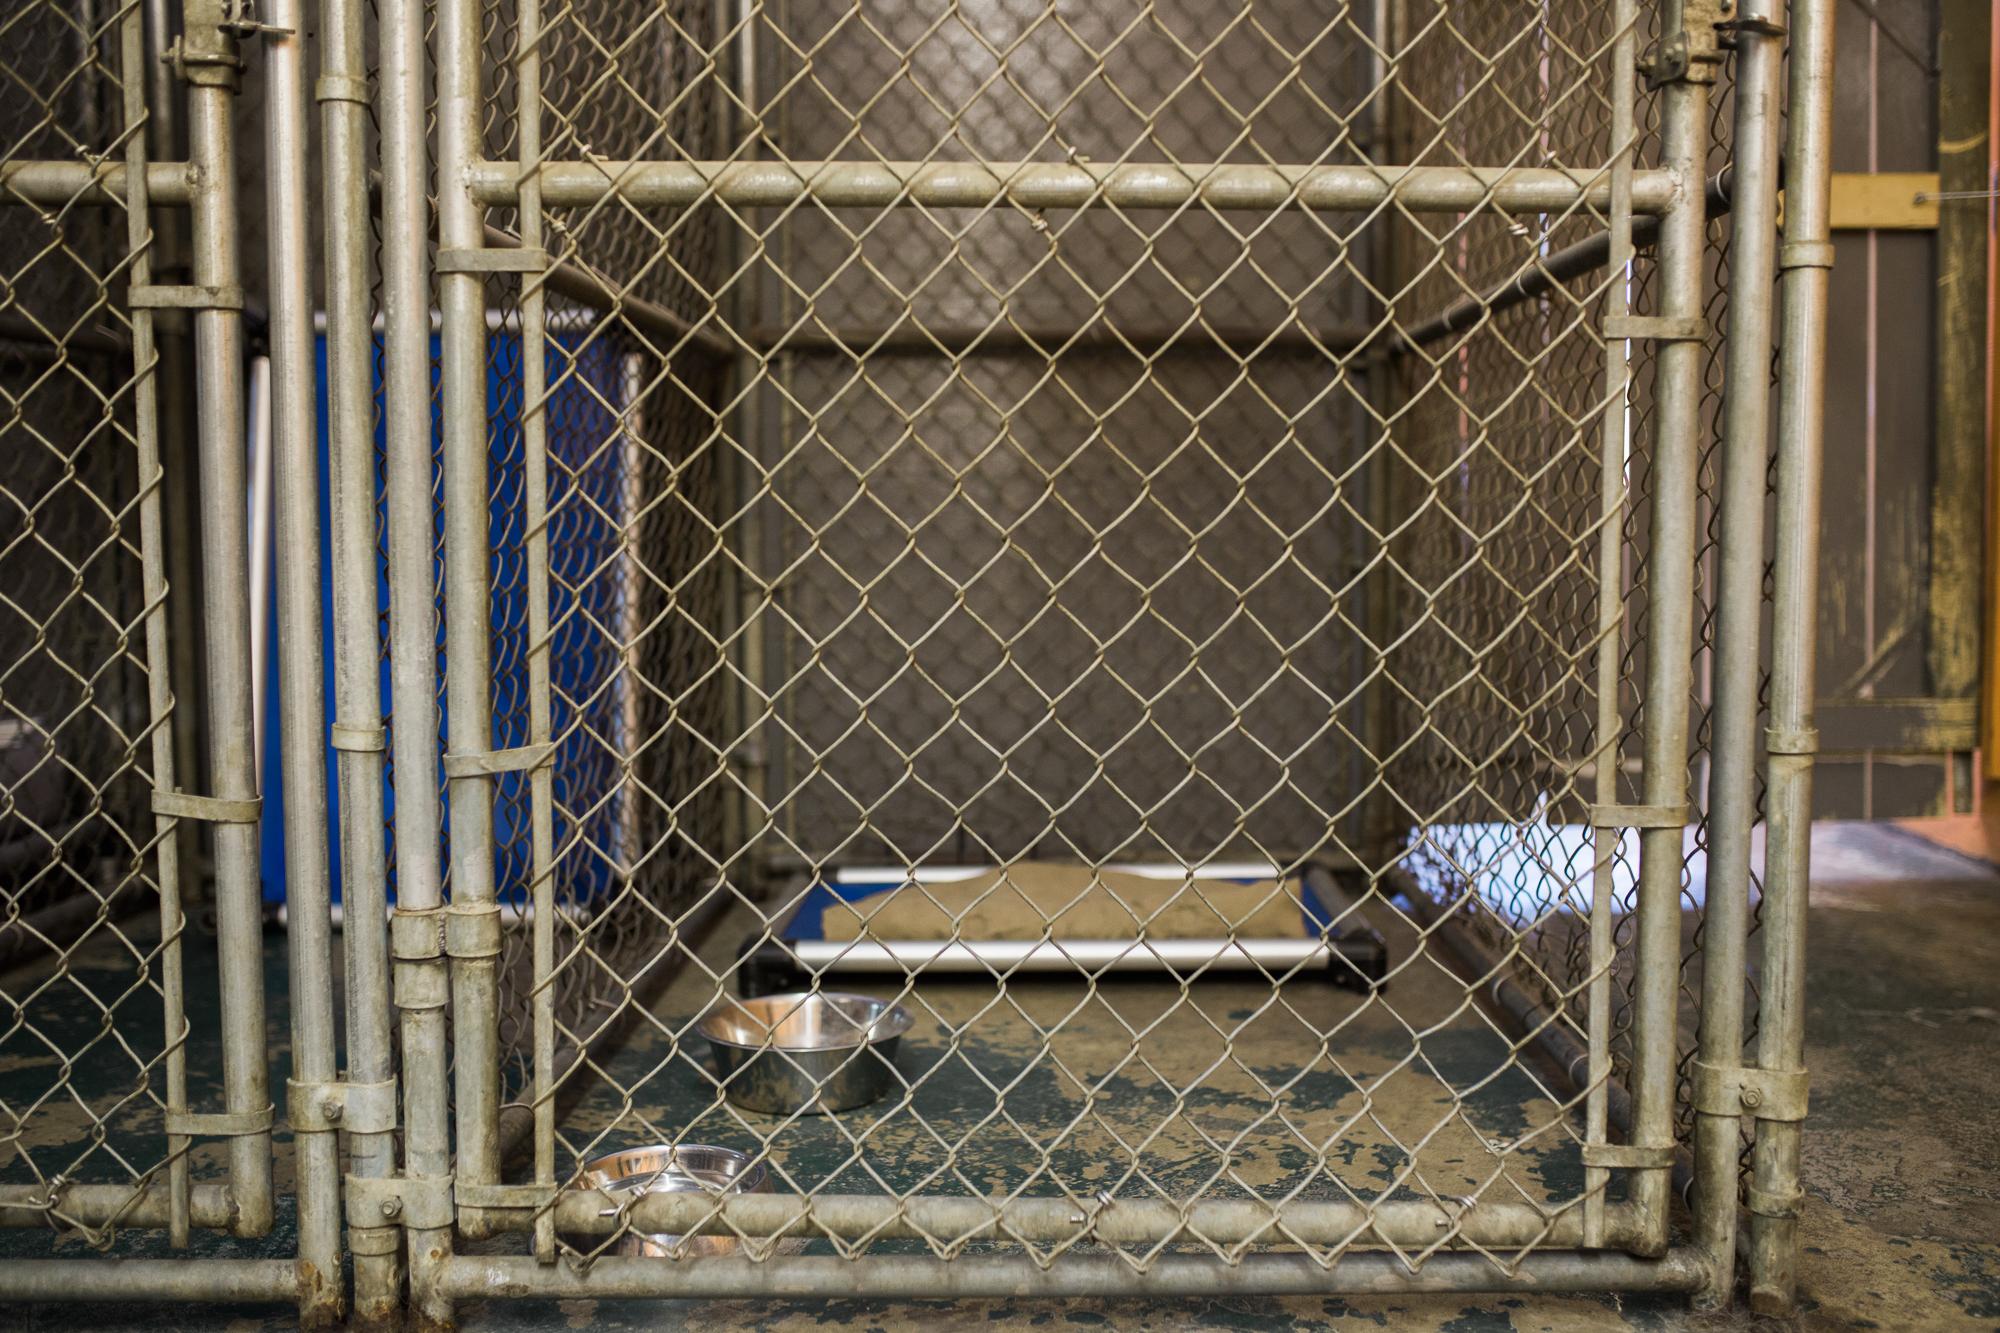 Barking-Good-Facility-20.jpg